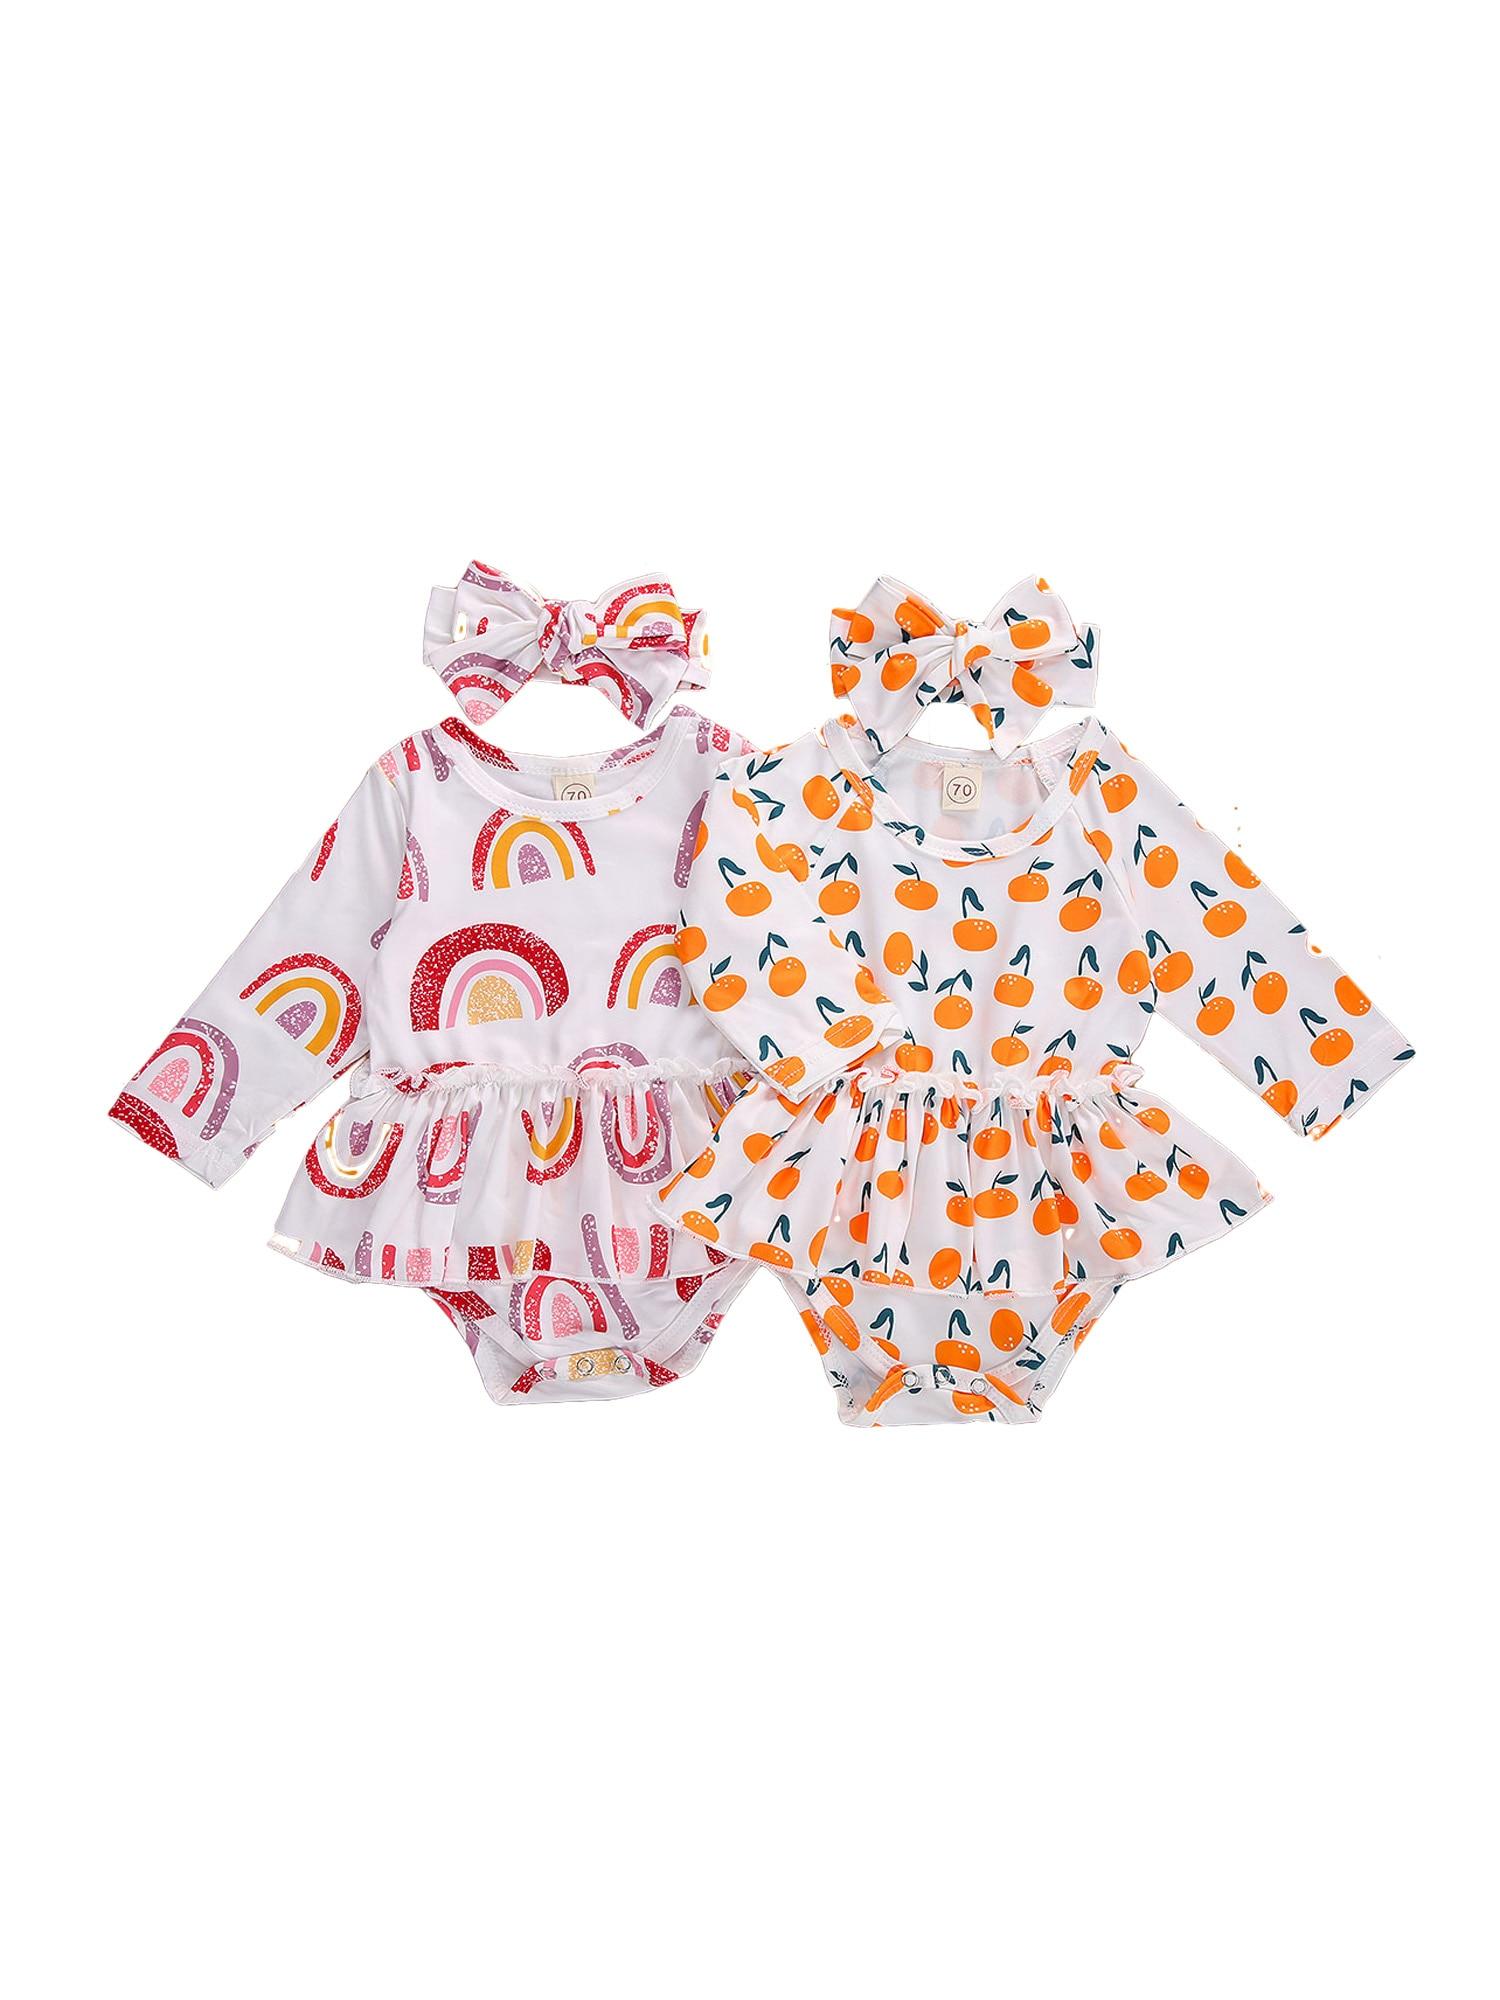 Imcute, monos de verano con estampado naranja de arcoíris a la moda para niñas, mono de manga larga con triángulo envuelto y diadema